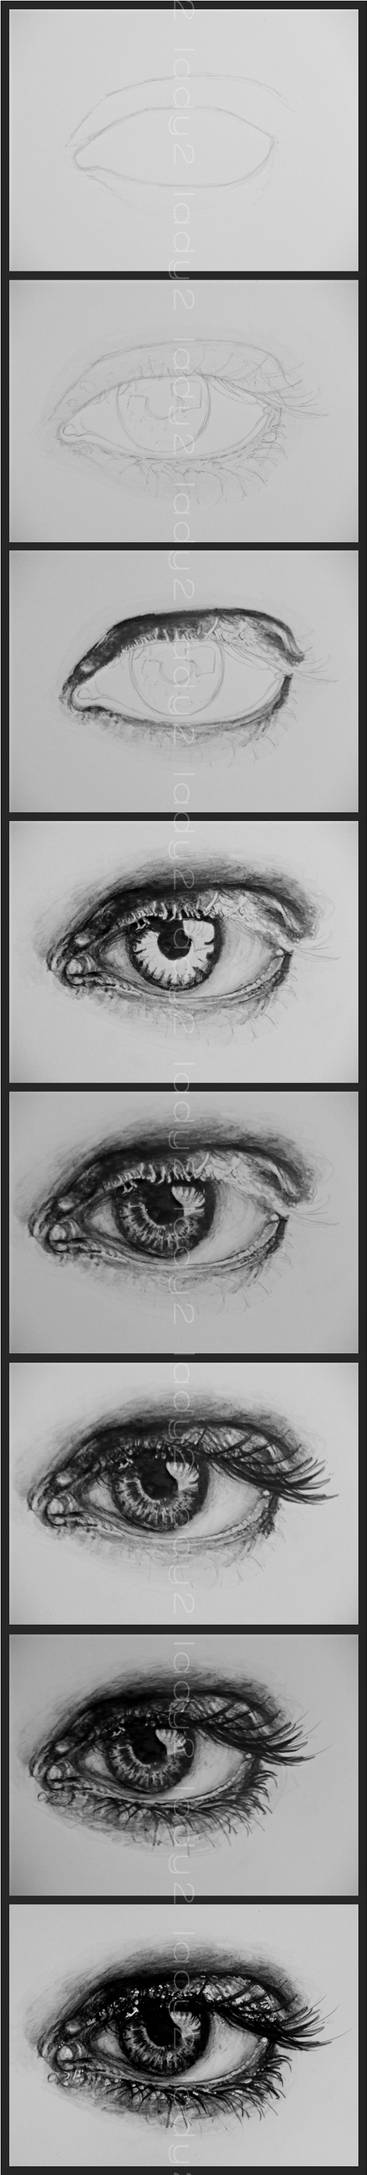 eye_tutorial